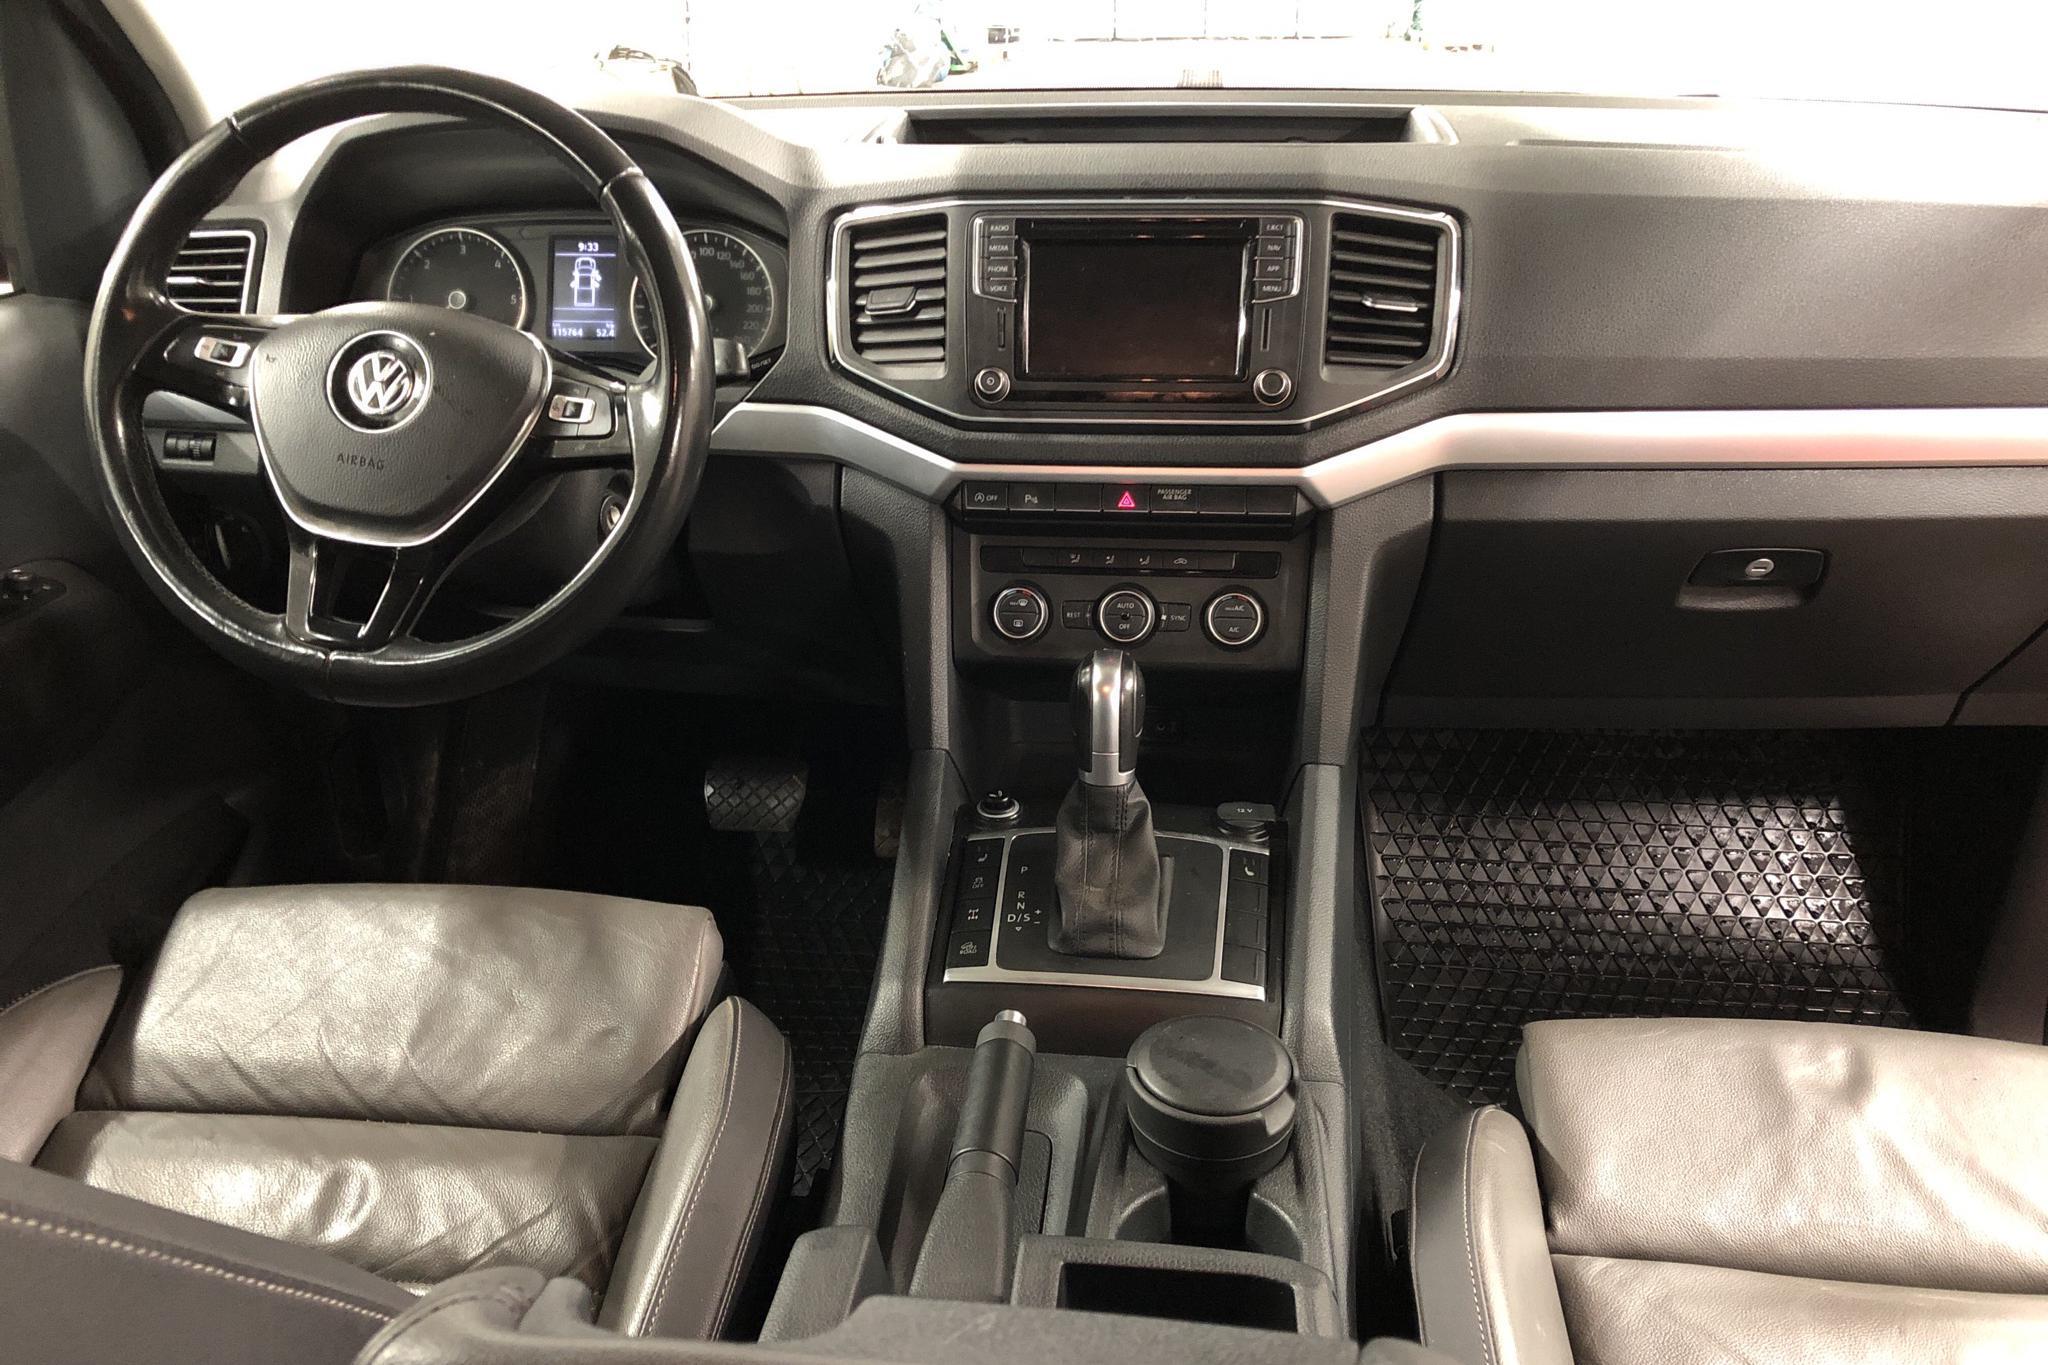 VW Amarok 3.0 TDI 4motion (224hk) - 11 577 mil - Automat - röd - 2018